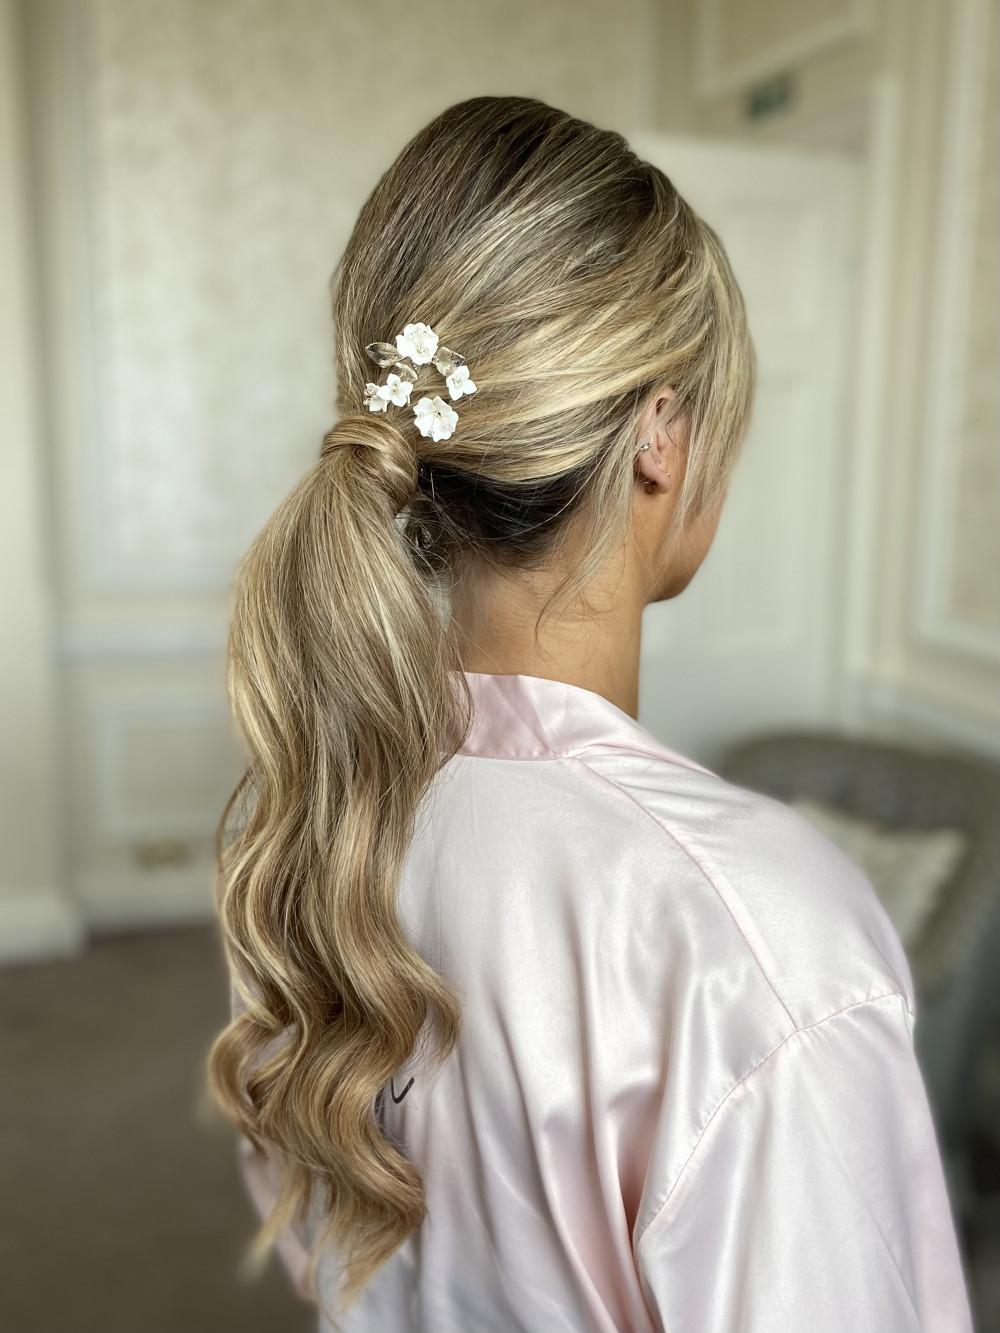 Chic ponytail adorned with @makemebridalaccessories - Make Me Bridal Artist: Jessica Makeup and Hairstyling. #glamorous #boho #bridalhair #hairup #weddinghair #ponytail #hampshirehair #surreyhair